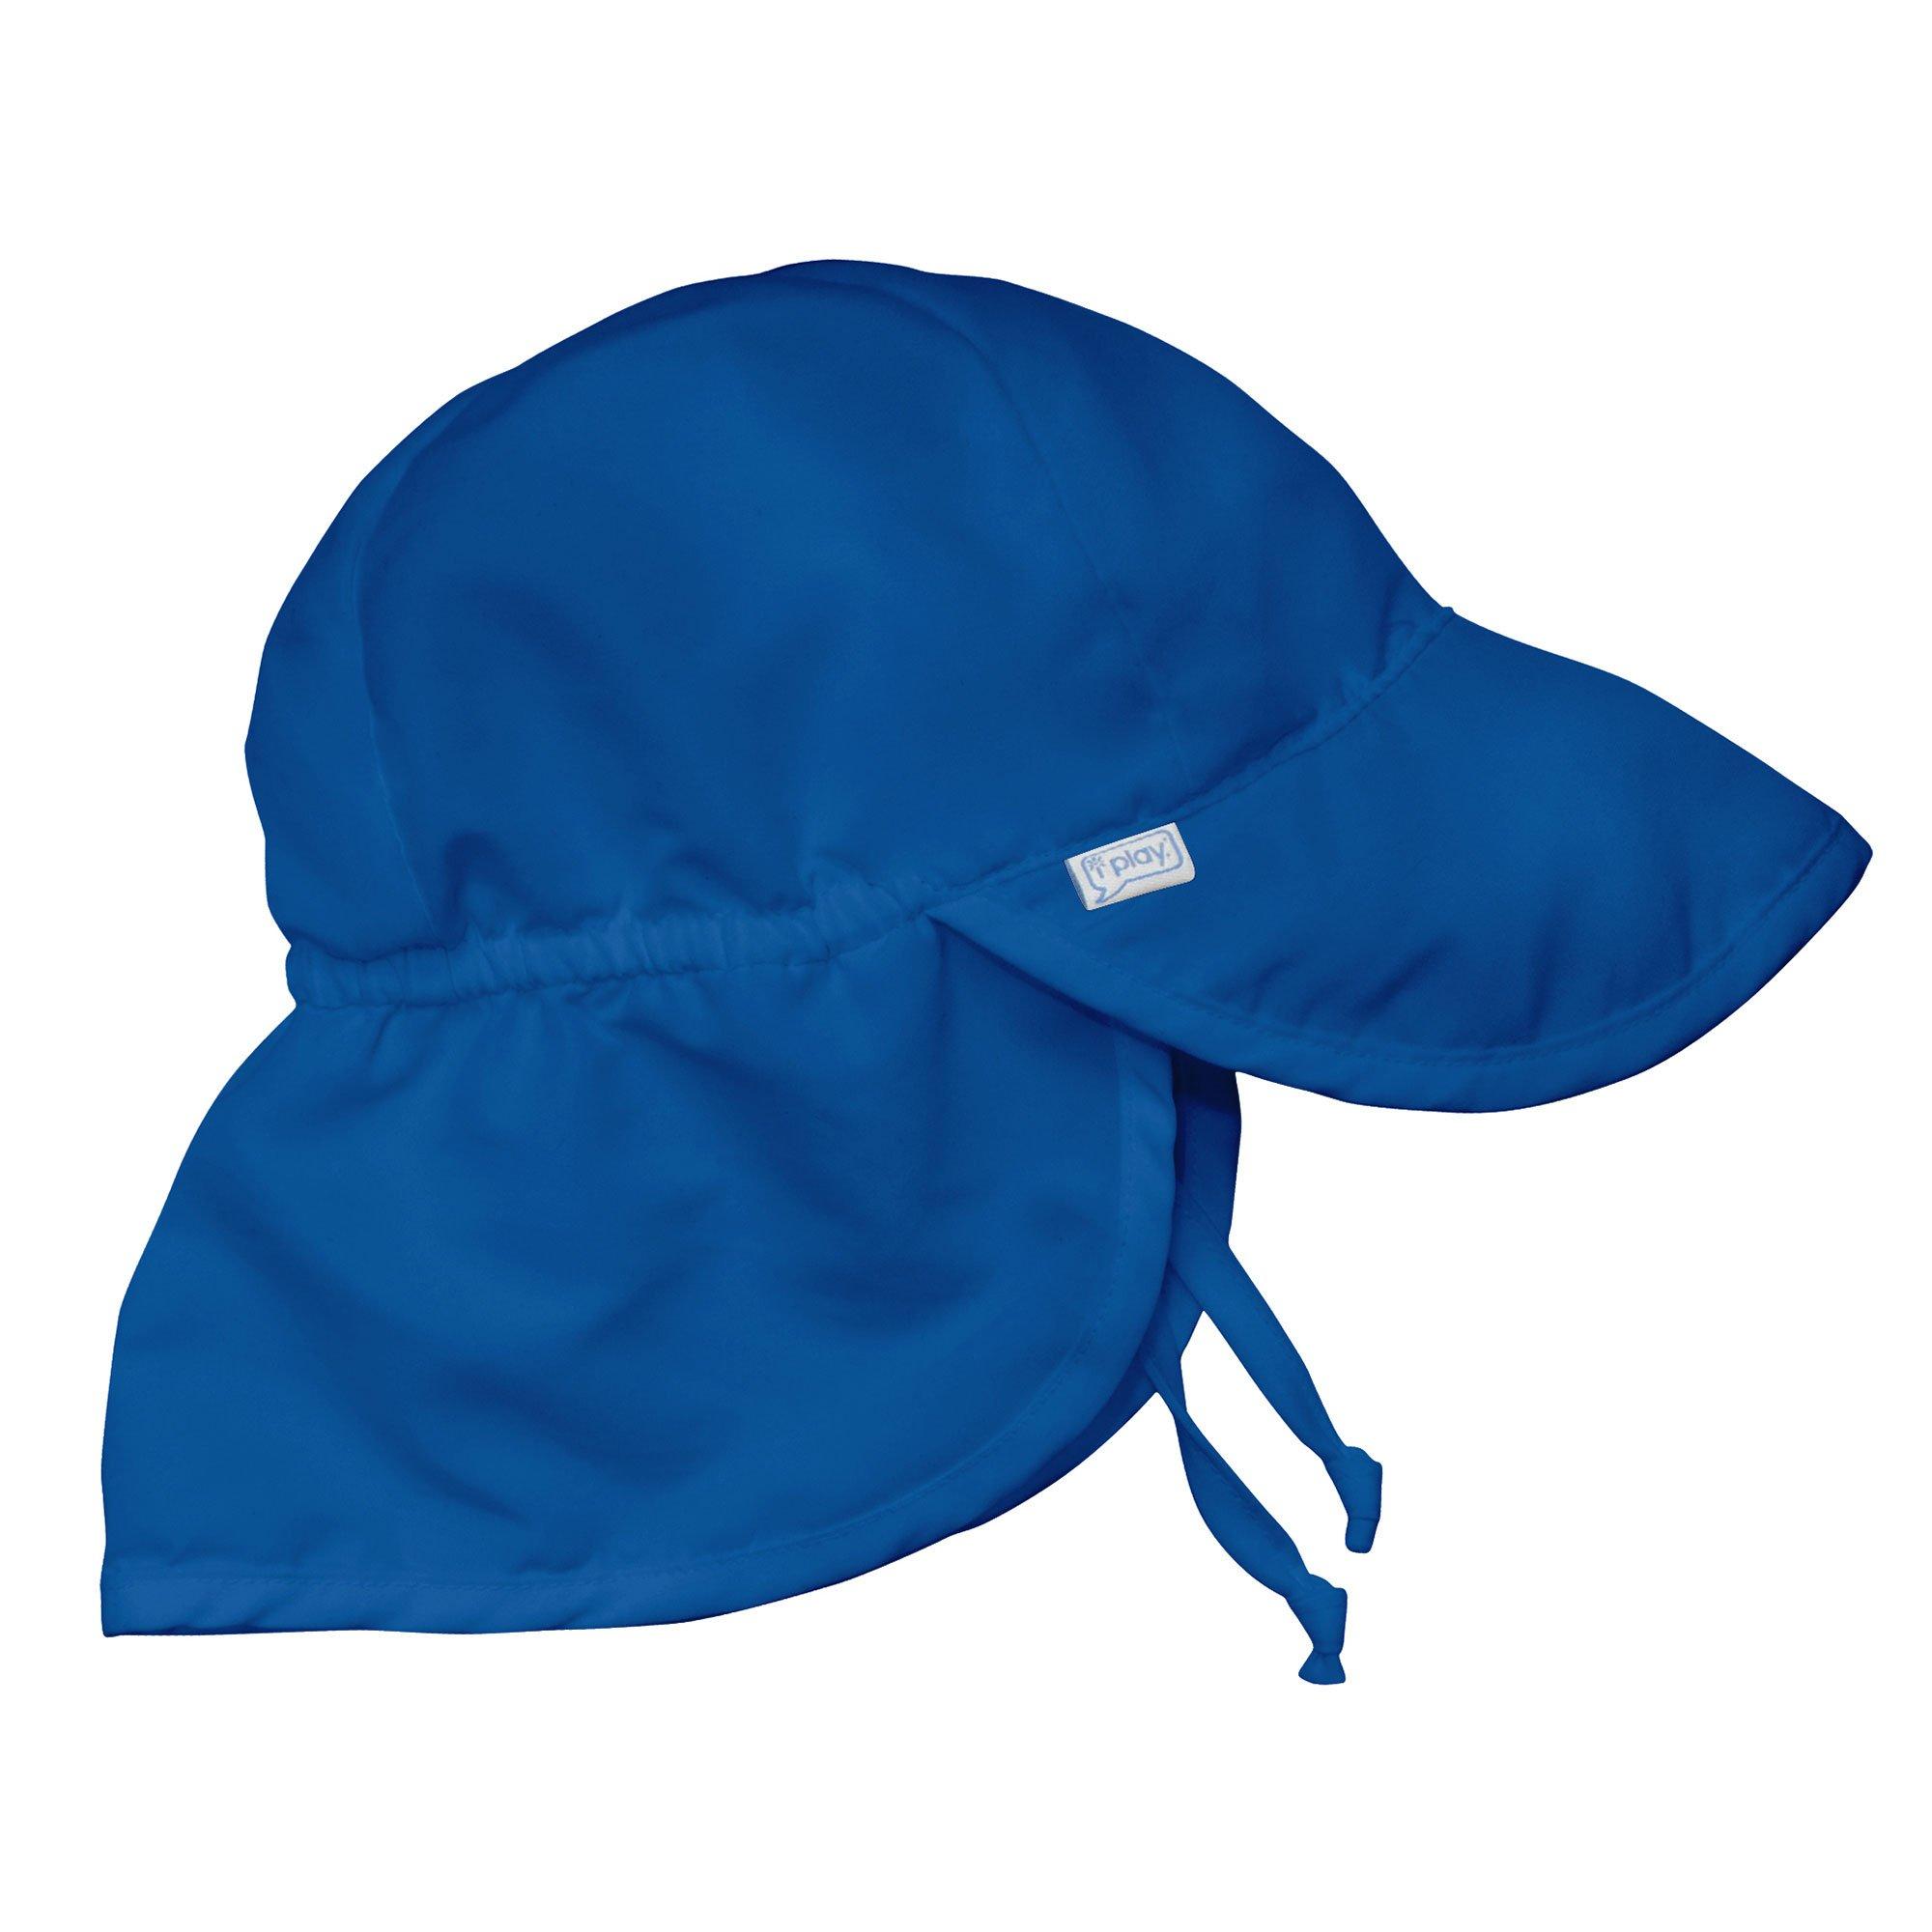 Iplay Flap Hat-Royal Blue-9/18mo by i play.